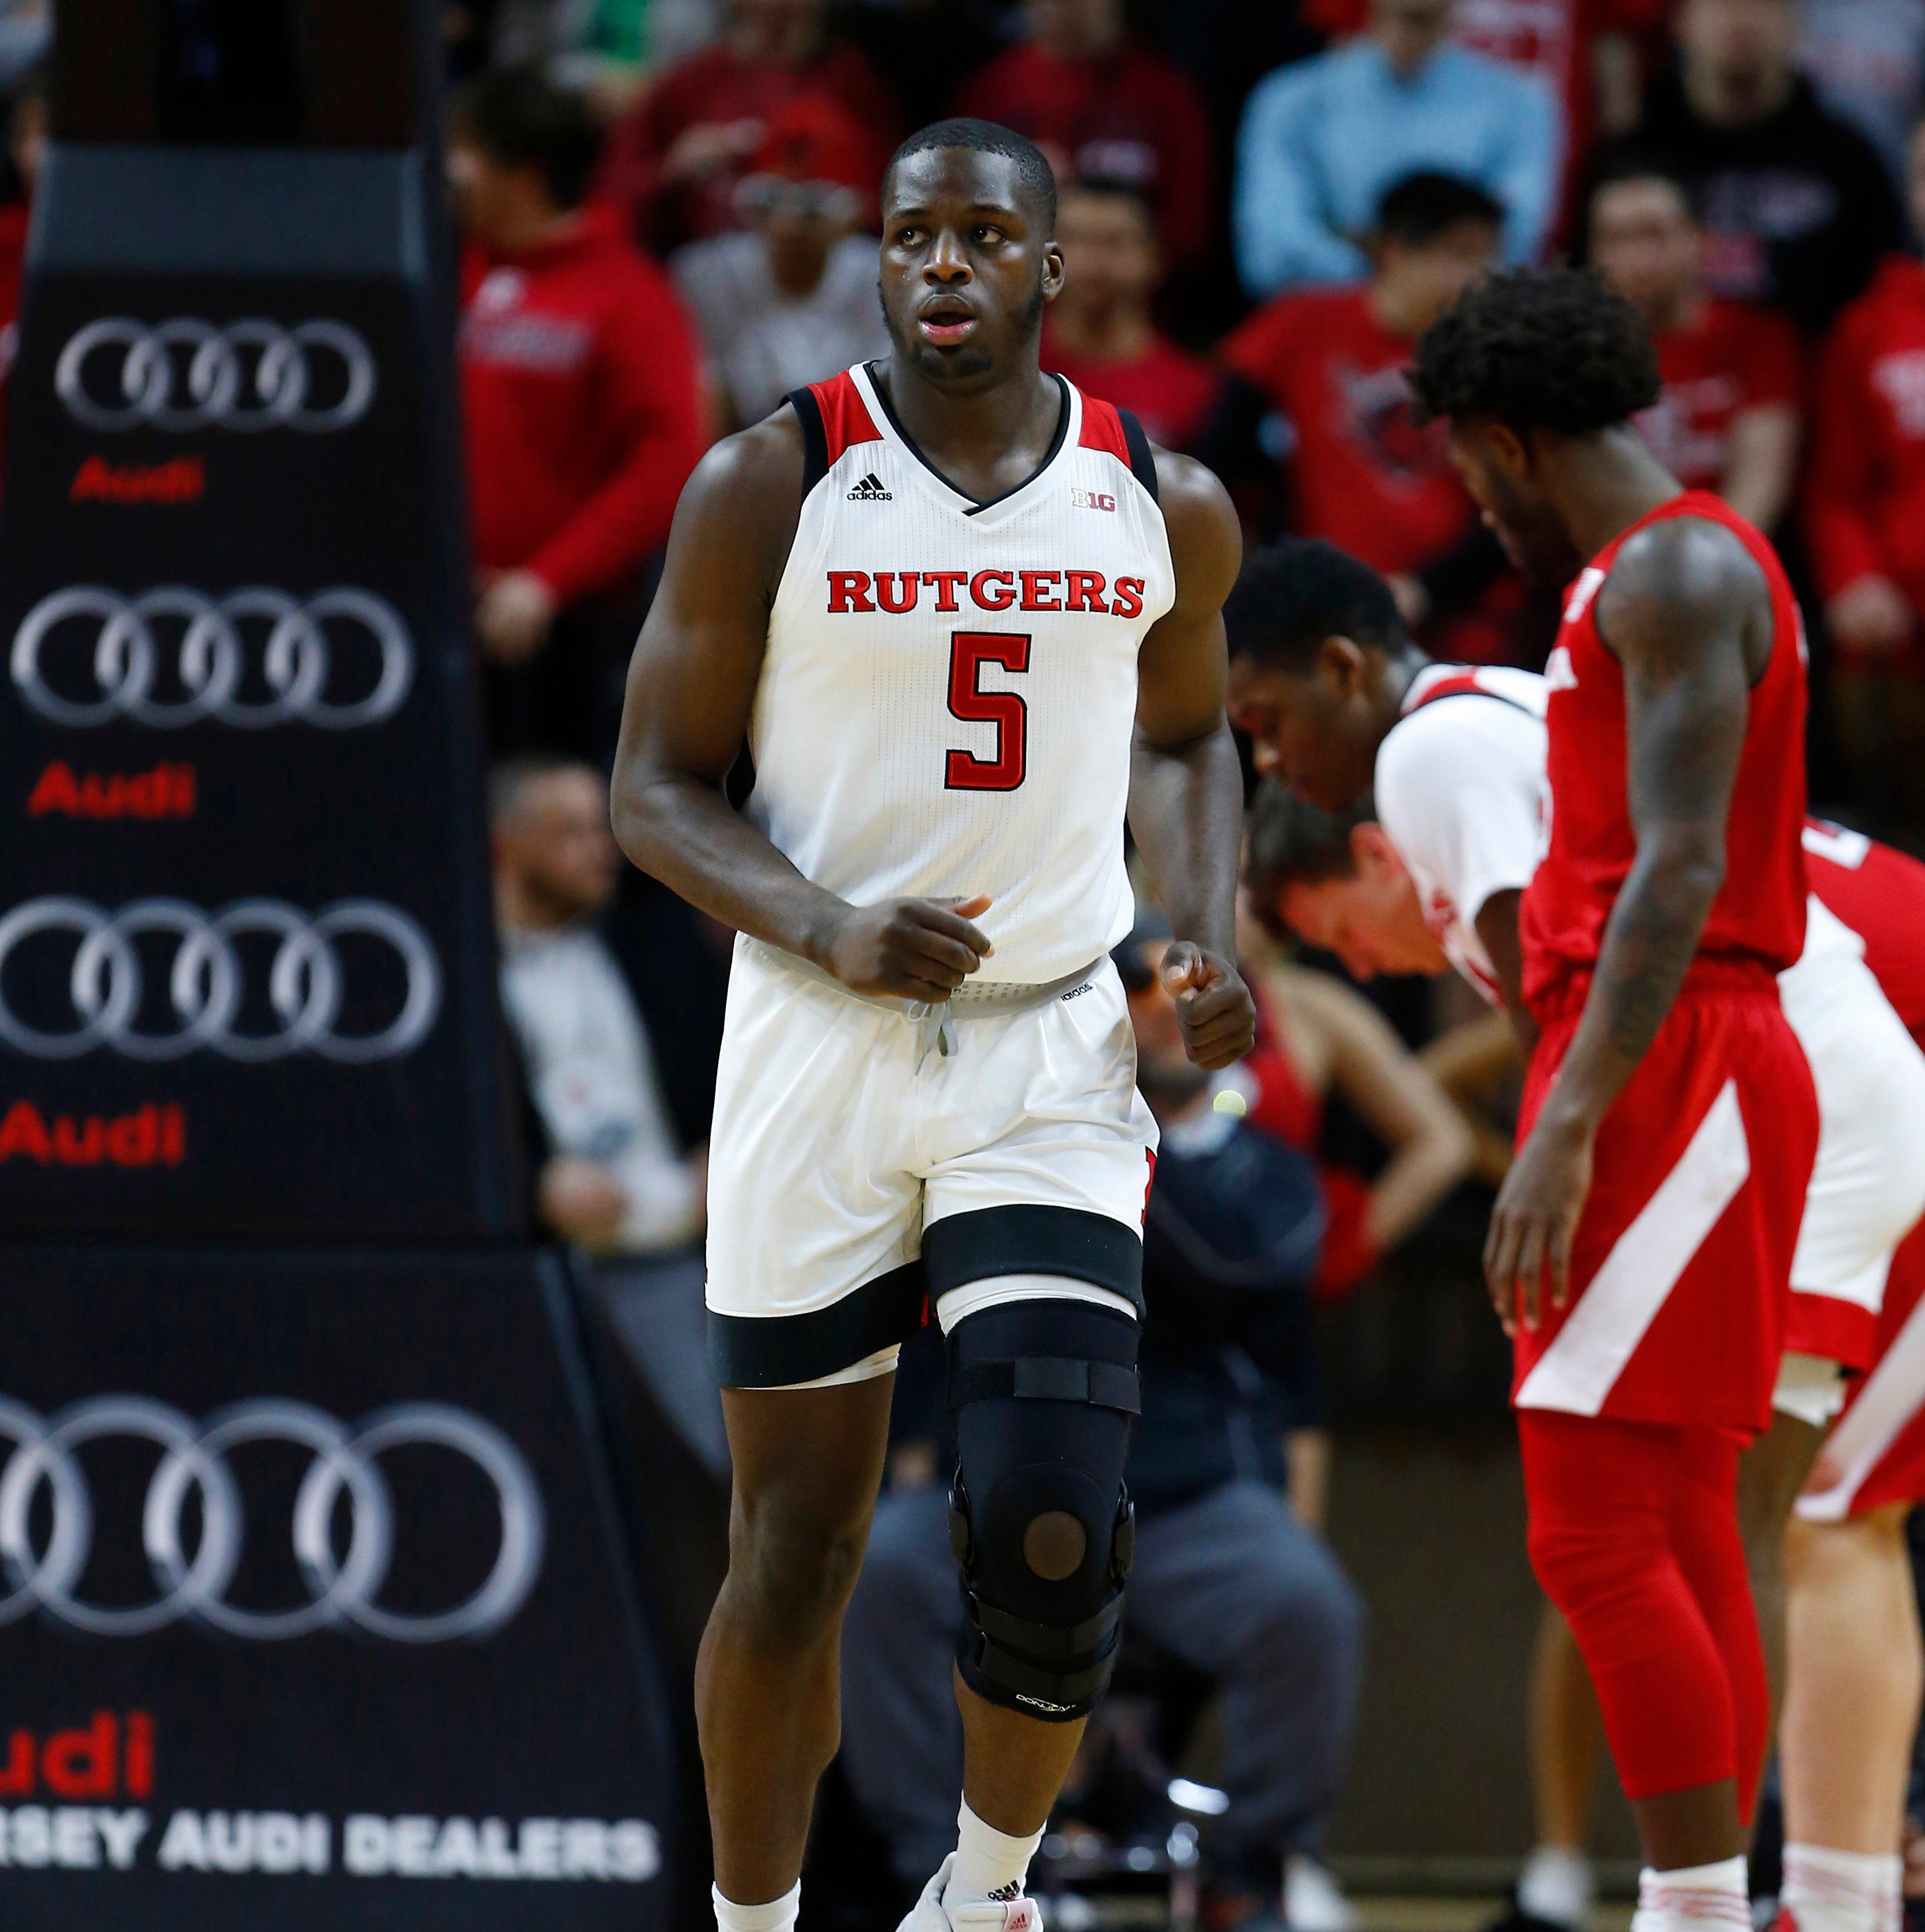 Rutgers basketball: Eugene Omoruyi returns from injury to spark upset of Nebraska